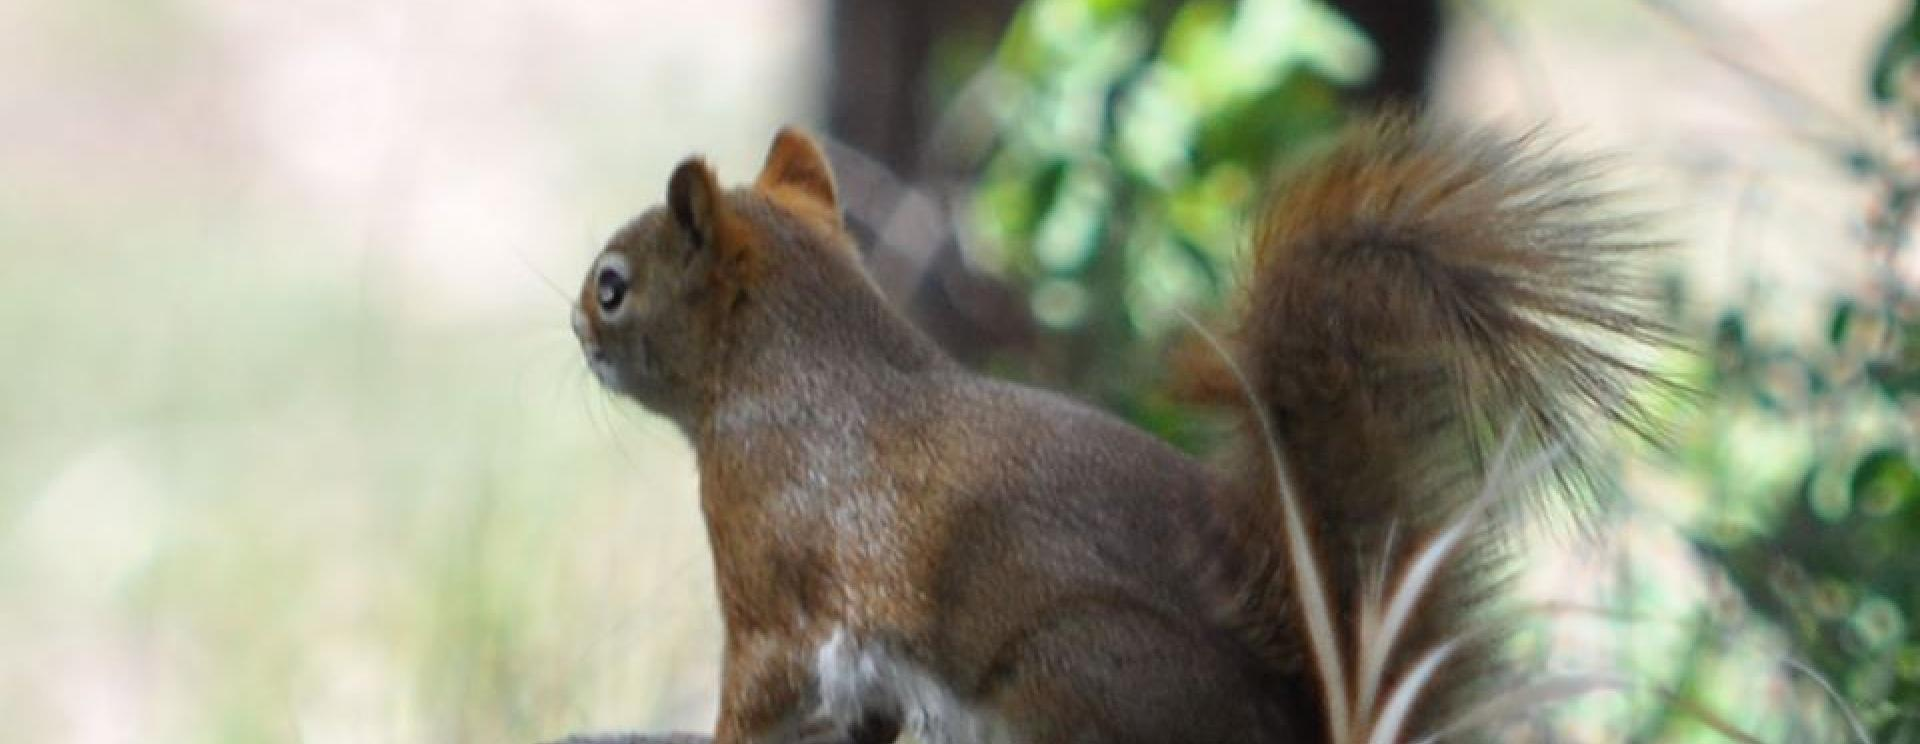 Junior Ranger Day / Animal Observations